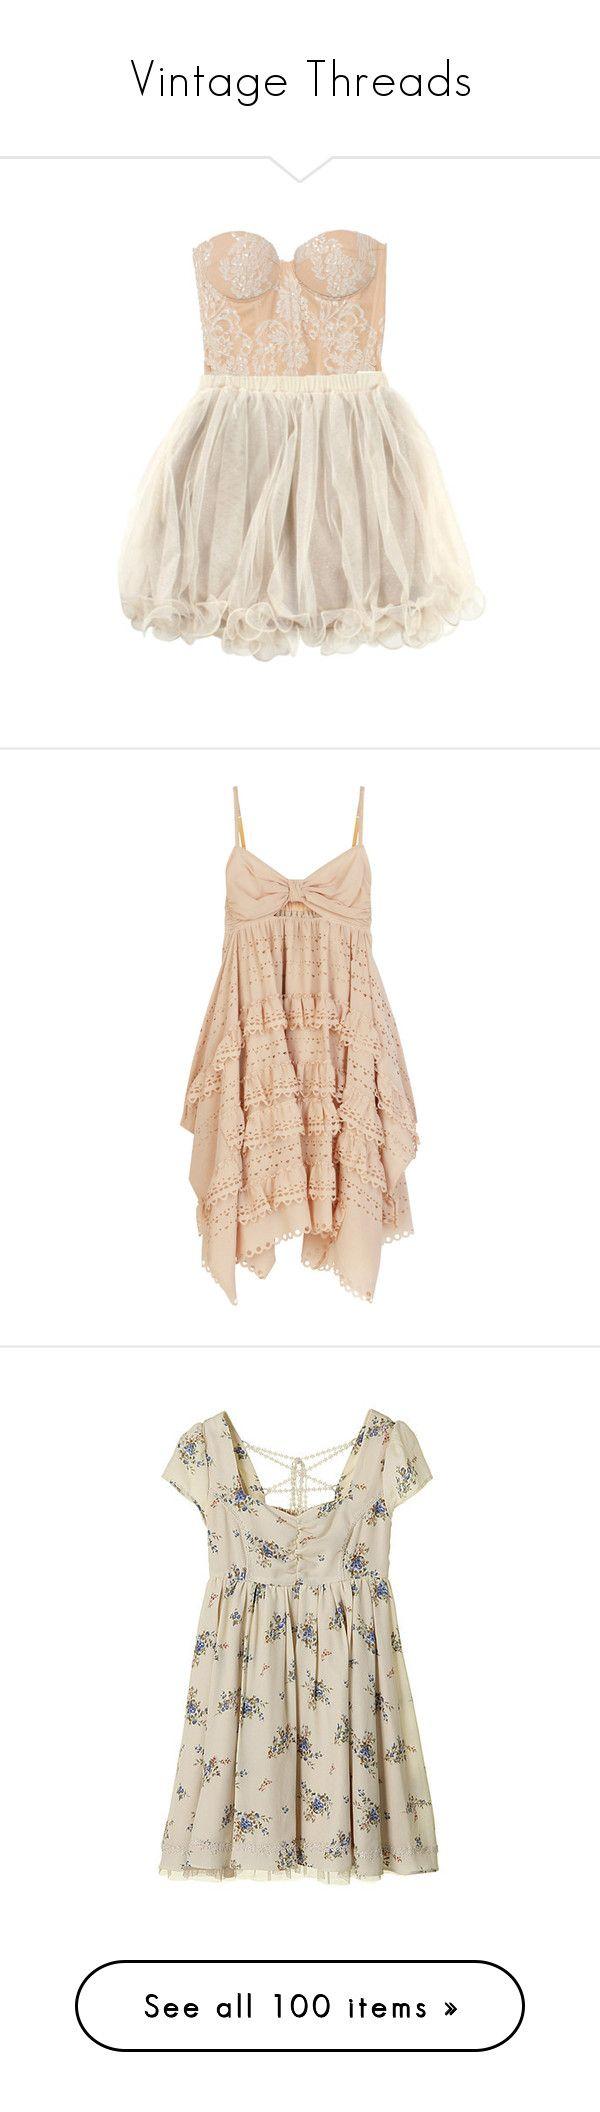 """Vintage Threads"" by krule ❤ liked on Polyvore featuring dresses, vestidos, short dresses, sukienki, tops, vestiti, women, holiday dresses, cocktail dresses and holiday cocktail dresses"